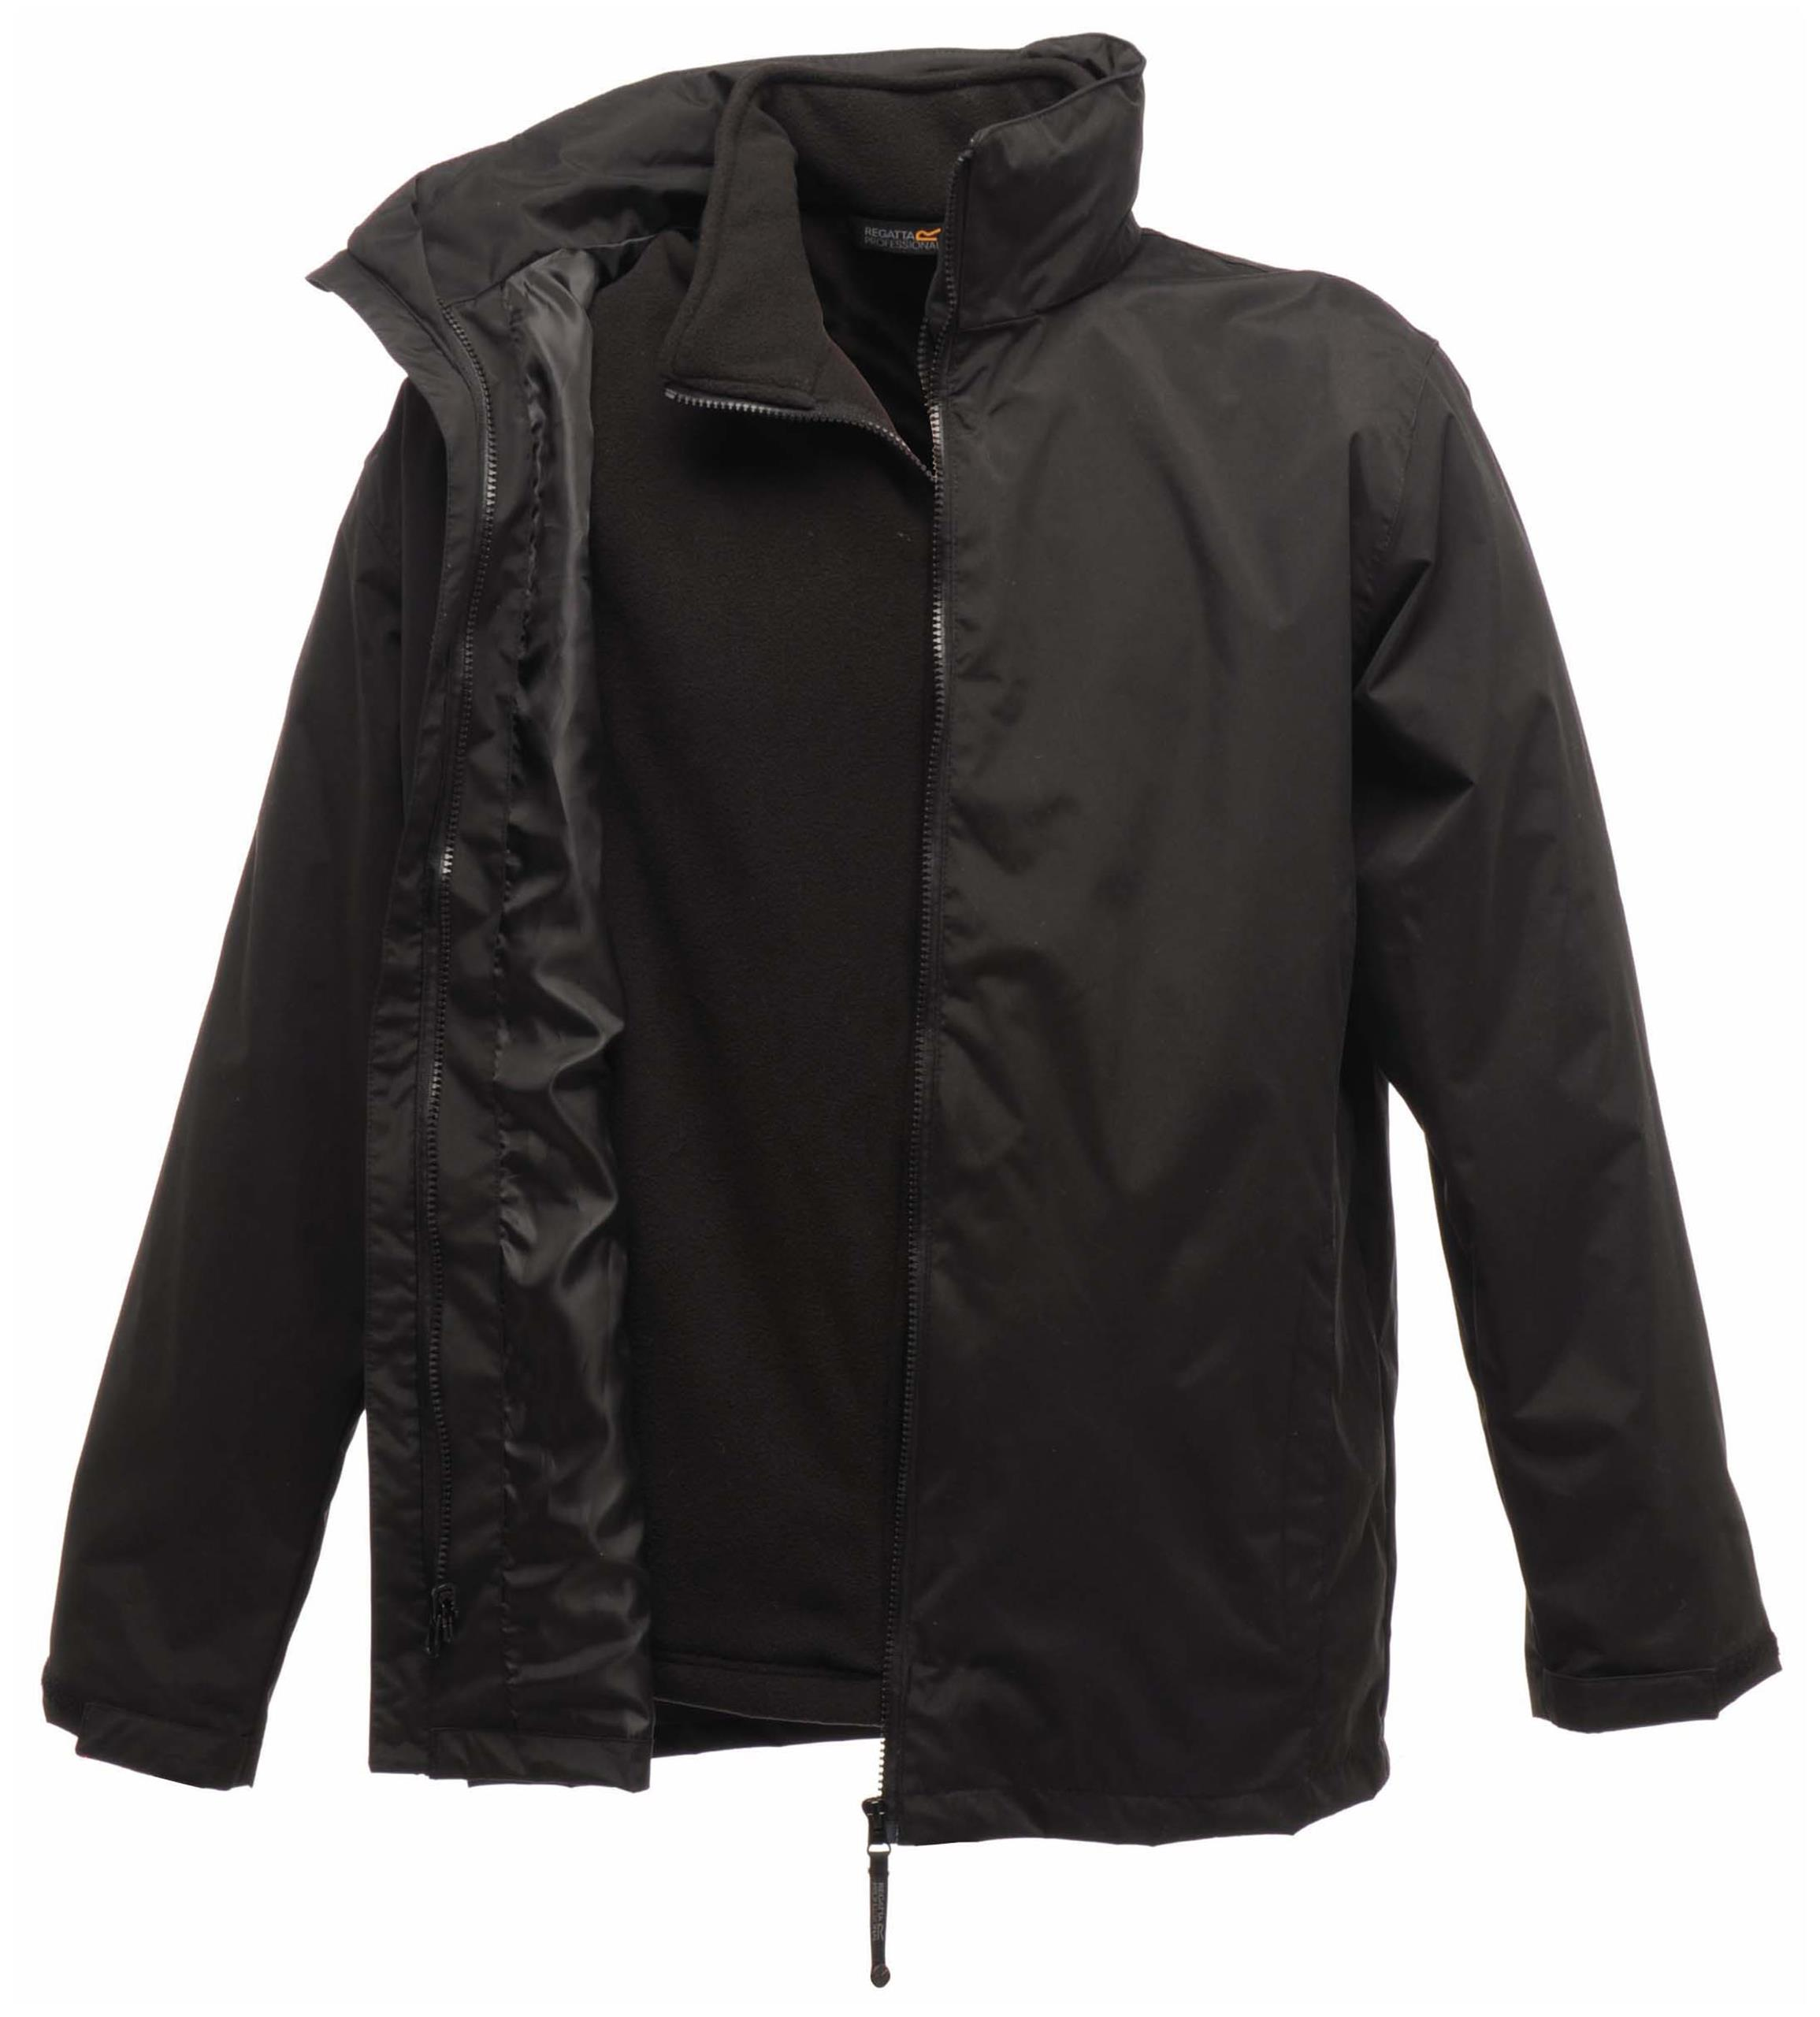 Mens regatta jacket - Mens Regatta Comfortable Waterproof Full Zipped Classic 3